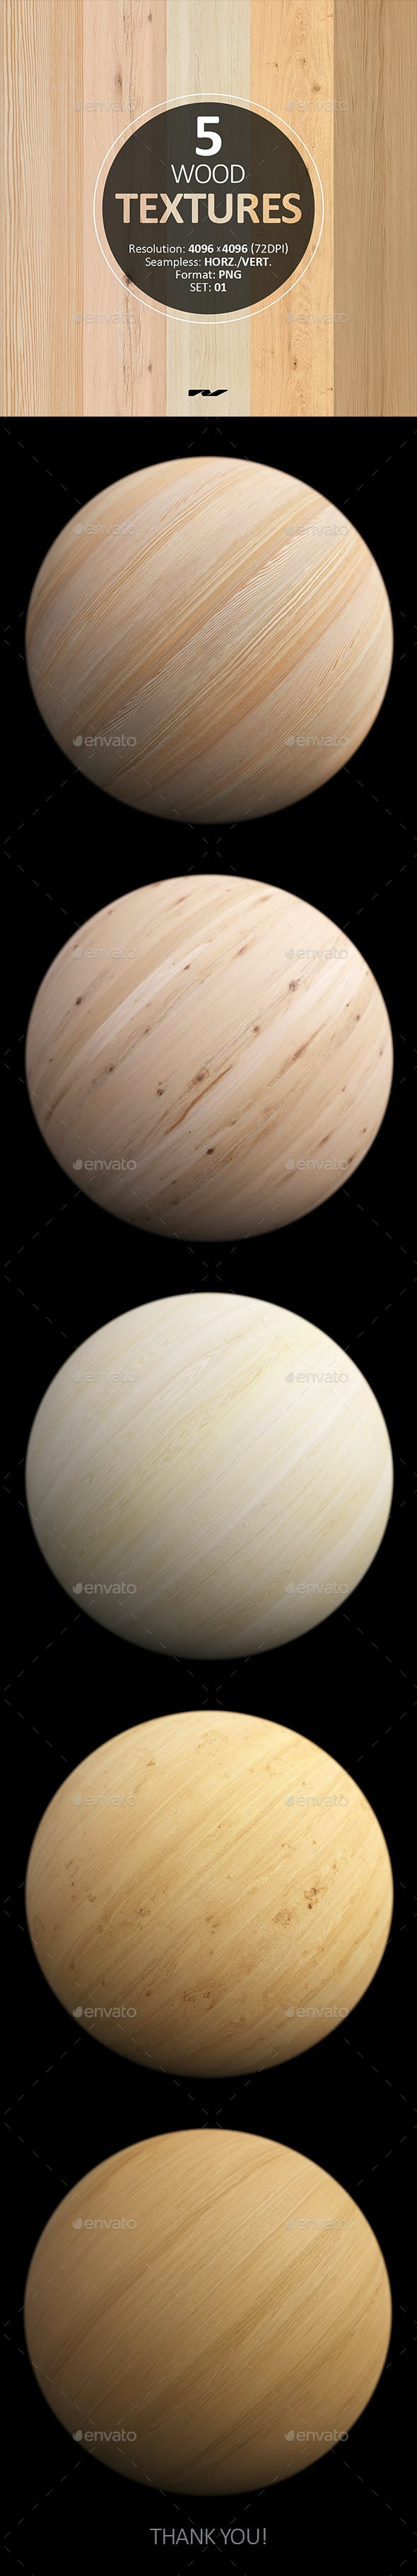 5 Wood Textures 4096x4096 / 72dpi / PNG. Set 01 - 3DOcean Item for Sale